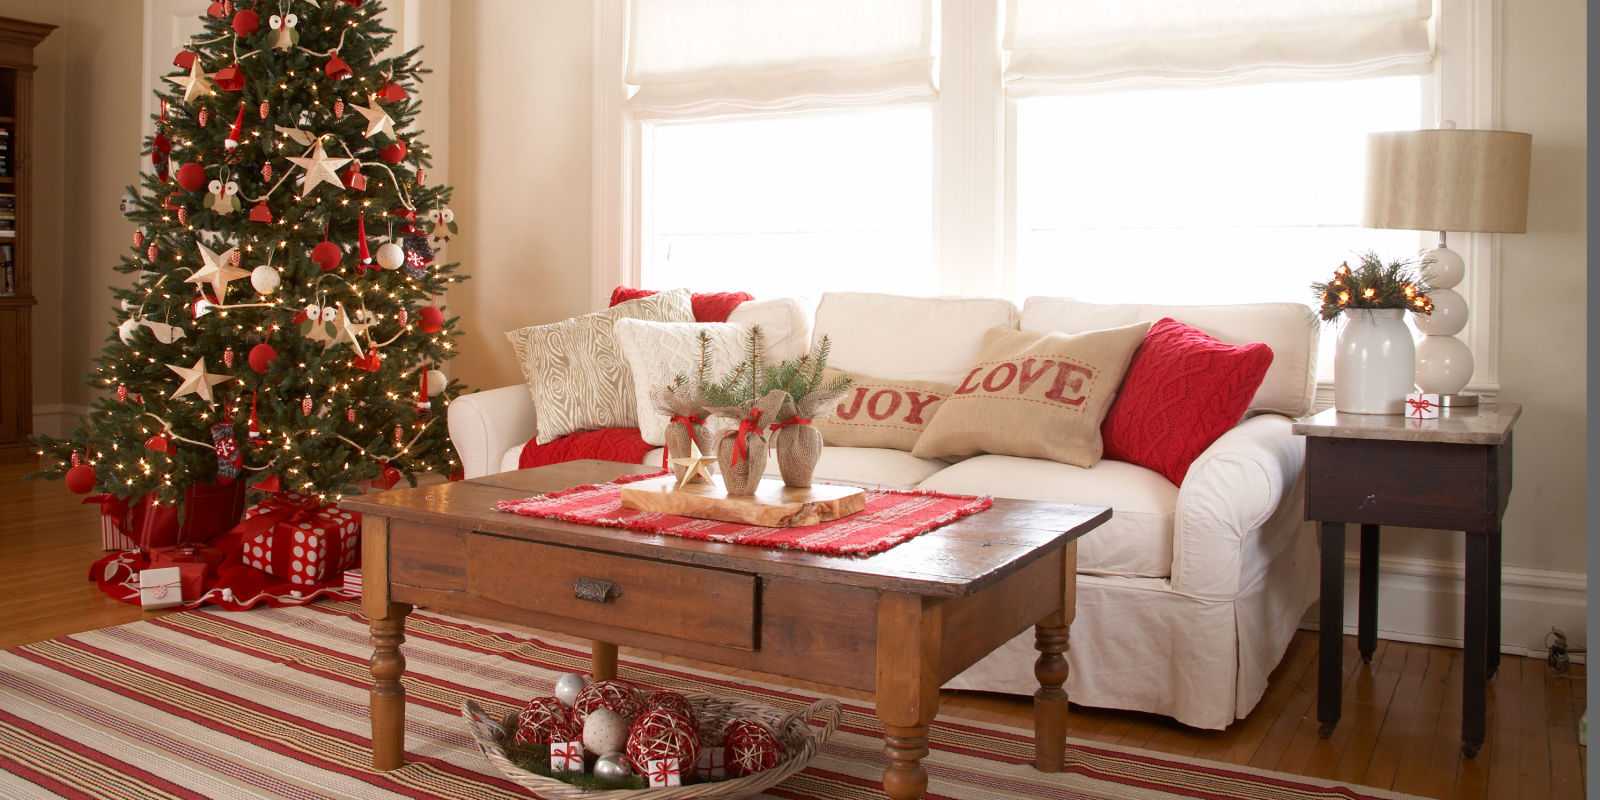 47 Easy DIY Christmas Decorations - Homemade Ideas for ...